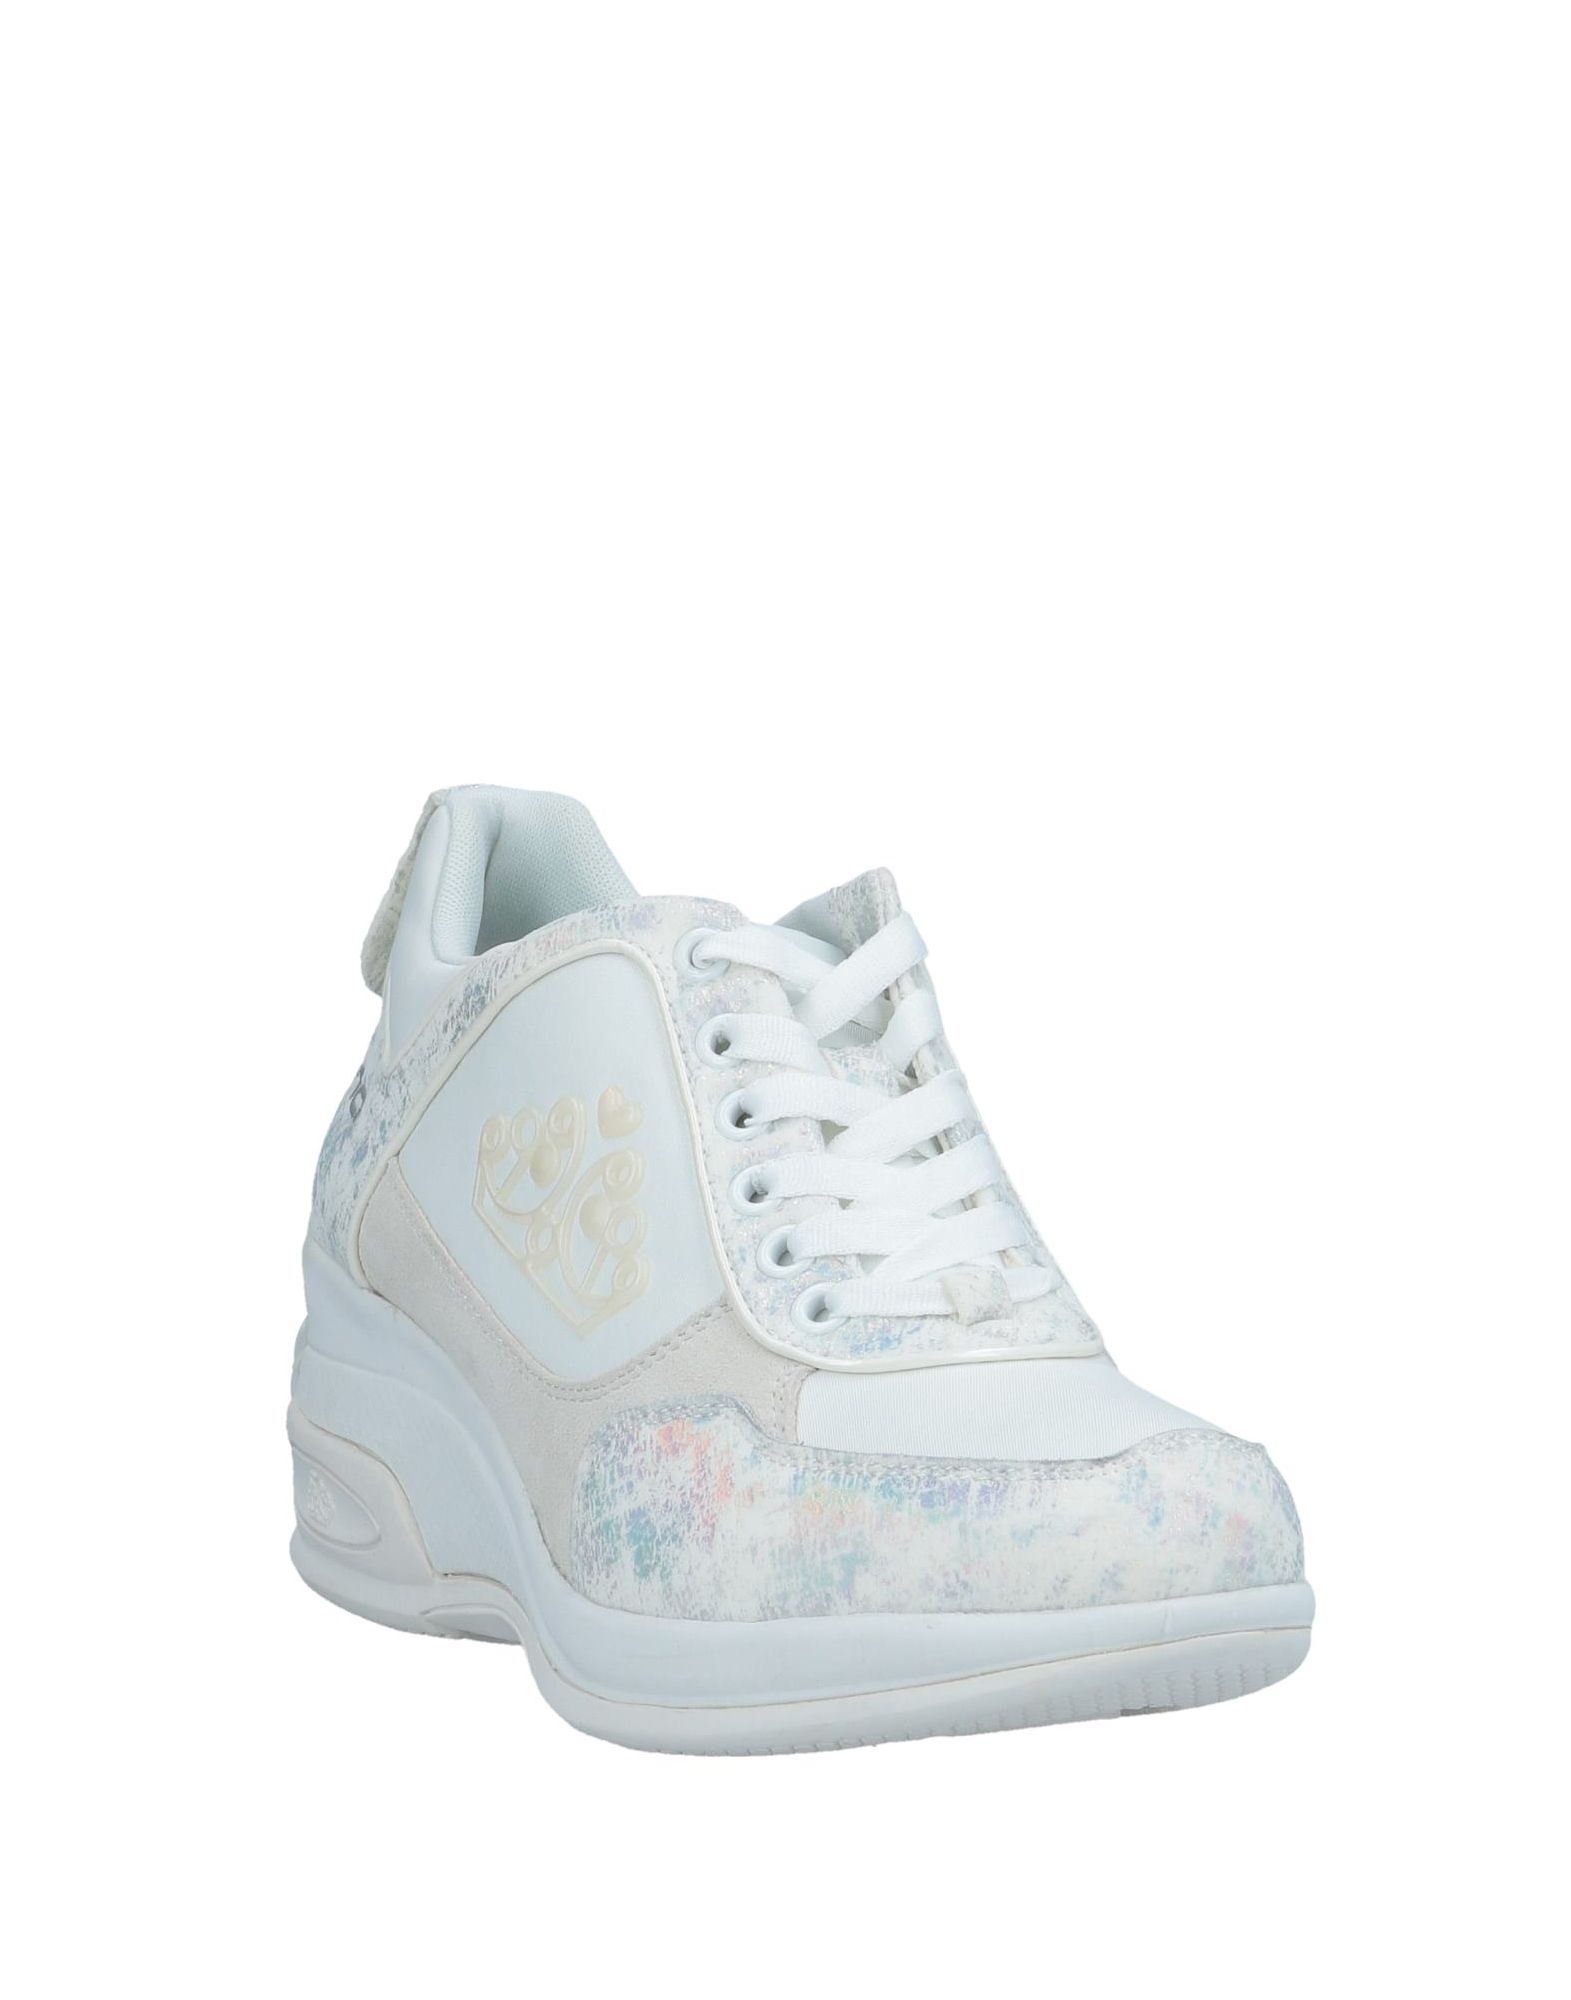 Fornarina Sneakers Sneakers Sneakers Damen  11554095NC Gute Qualität beliebte Schuhe 8d3c1a